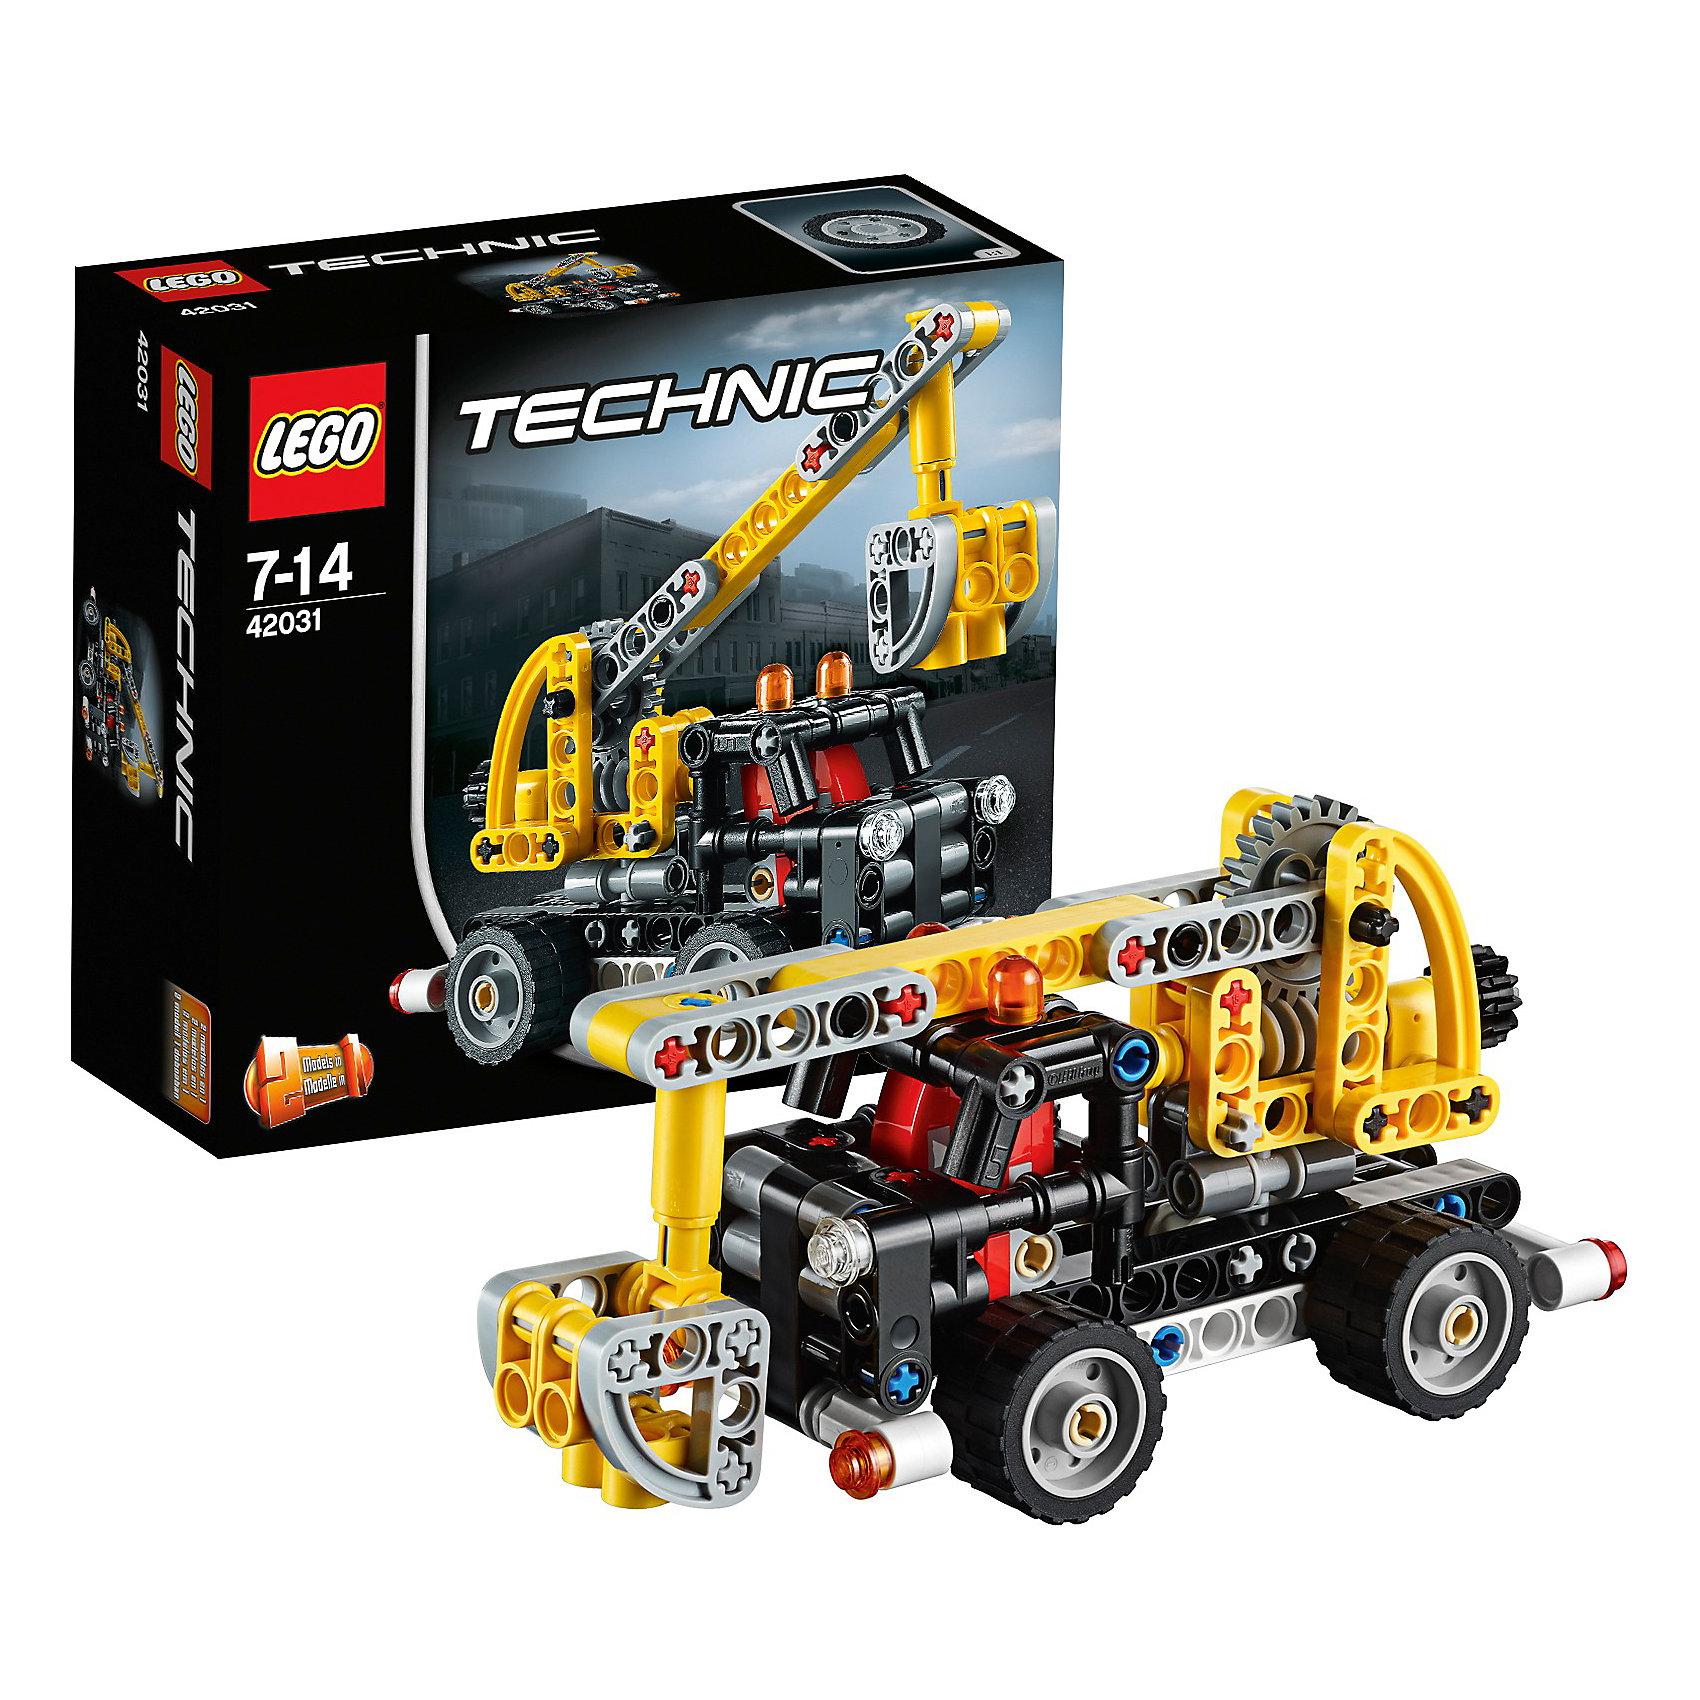 LEGO Technic 42031: Ремонтный автокран